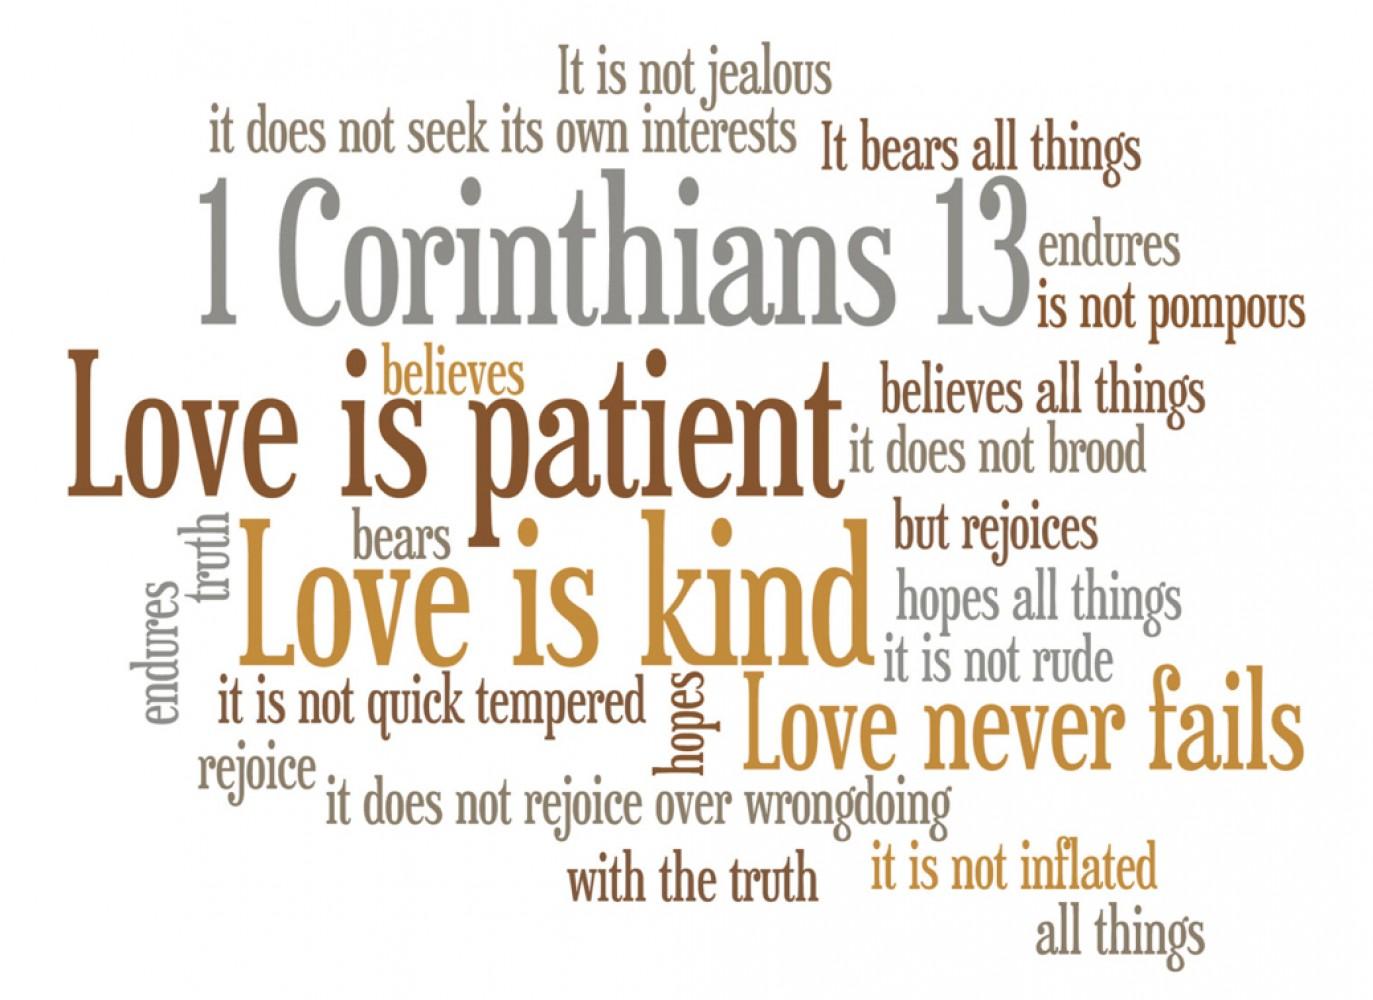 Sermon \ Pastor Terry Defoe \ Stewardship Initiative \ I Cor 13:13 \ Building Relationships